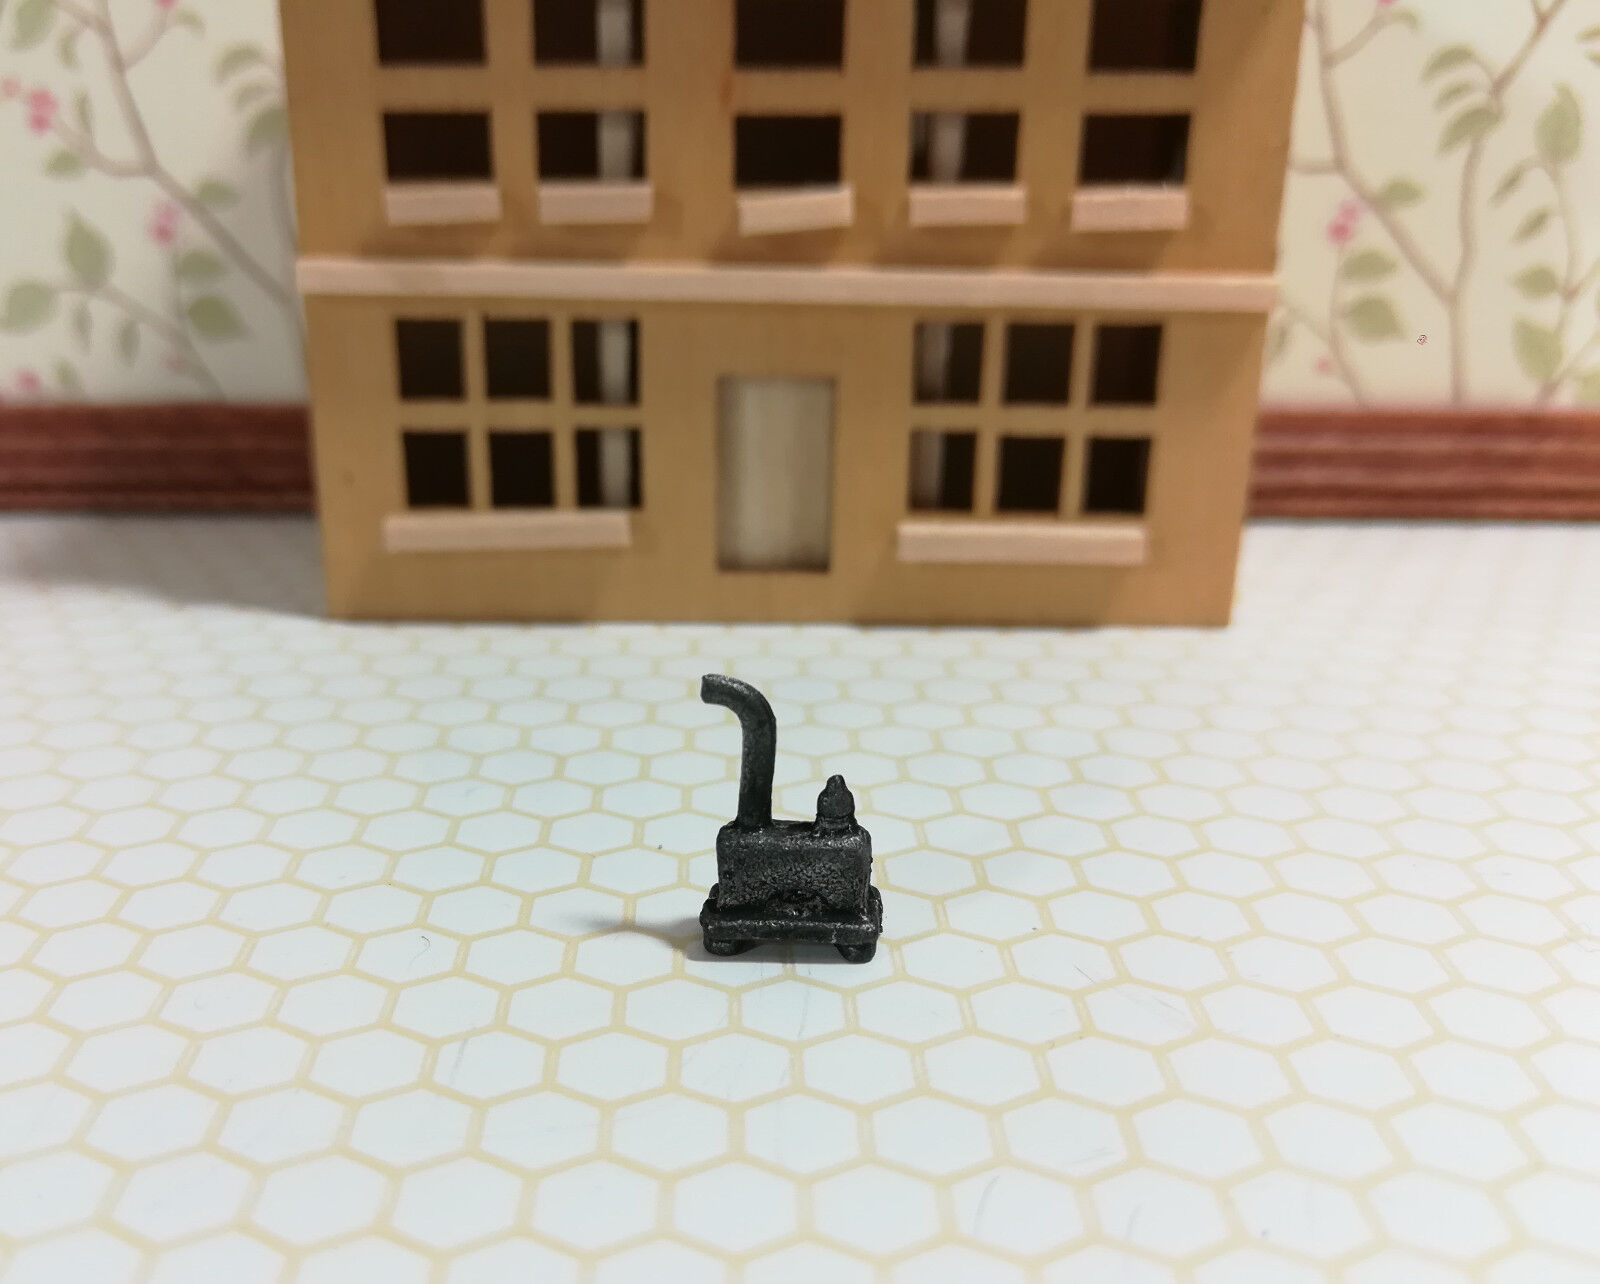 Dollhouse Miniature 1:144 Scale Wood Burning Stove Heater Mi